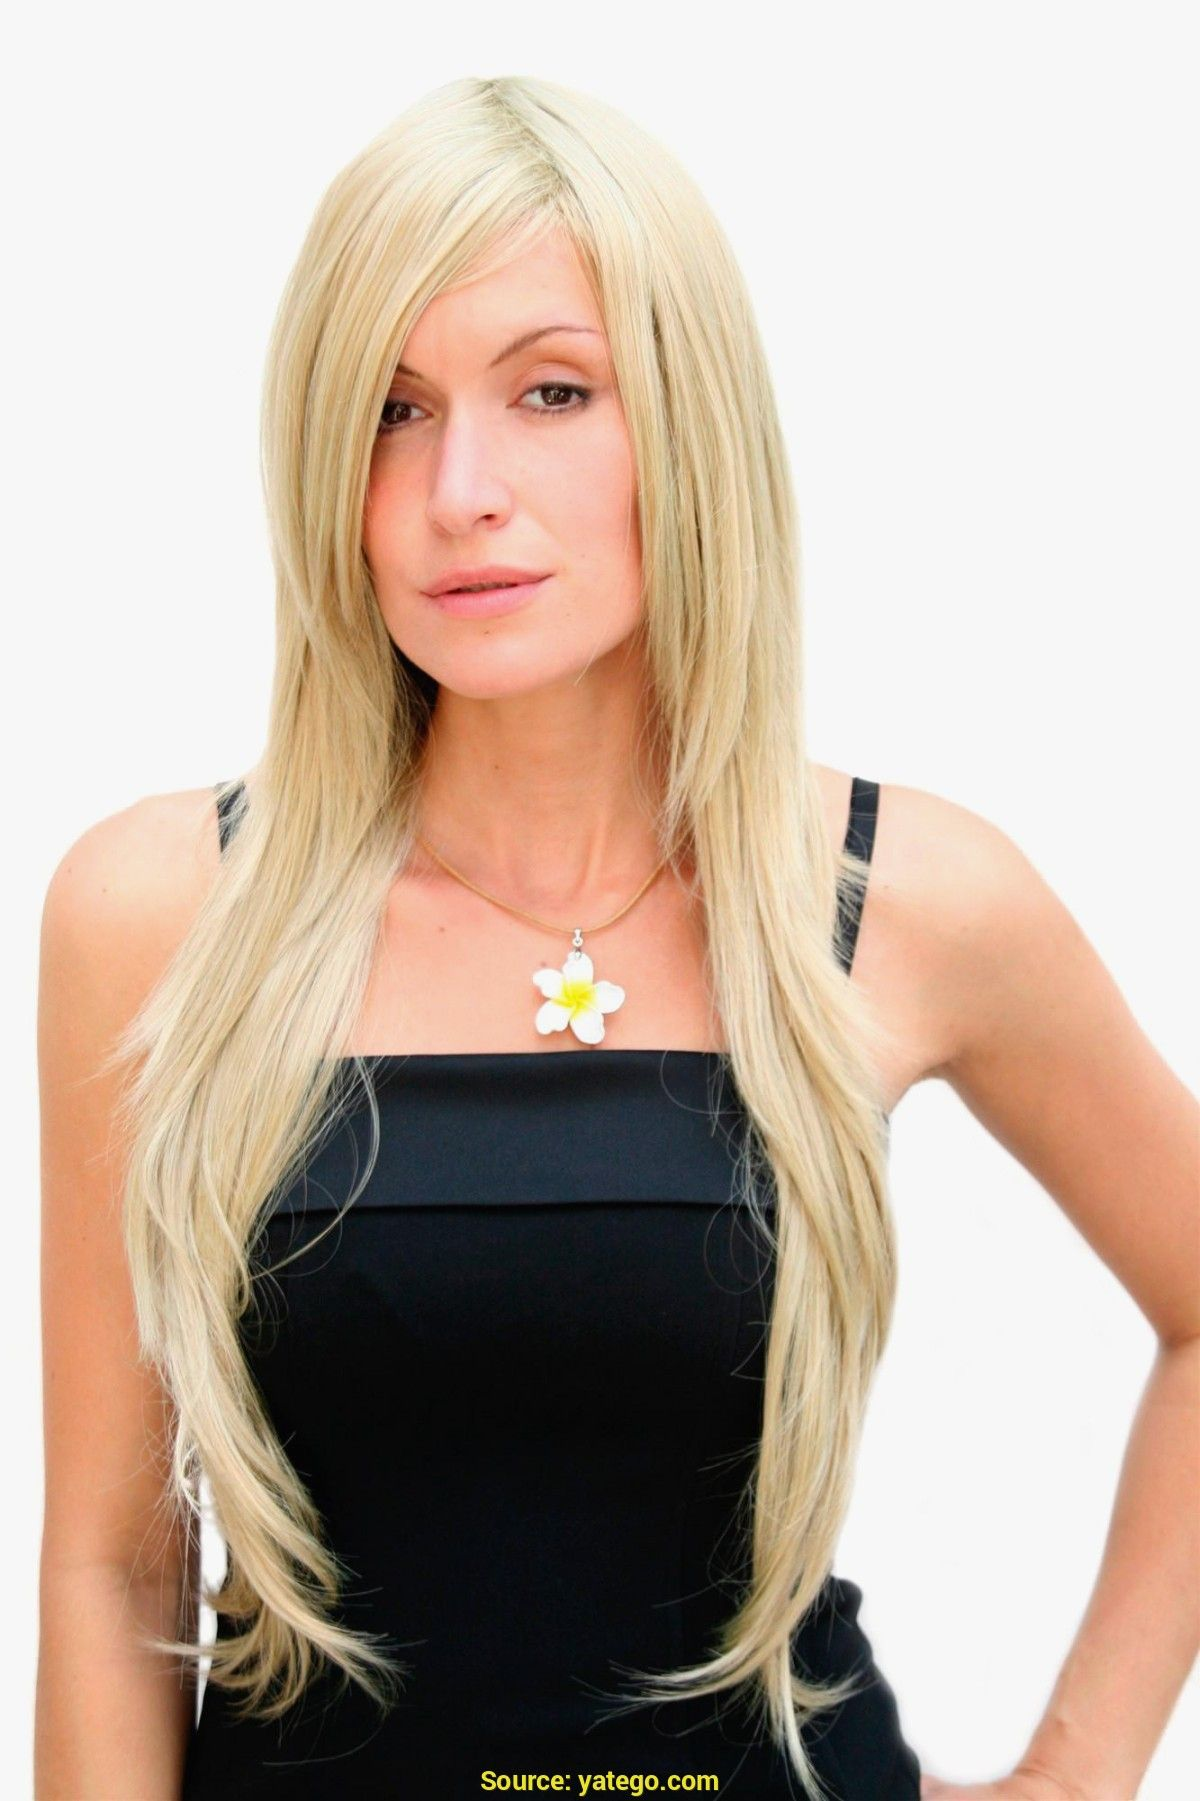 Frisuren Fur Lange Glatte Haare Hair Style Women Pinterest